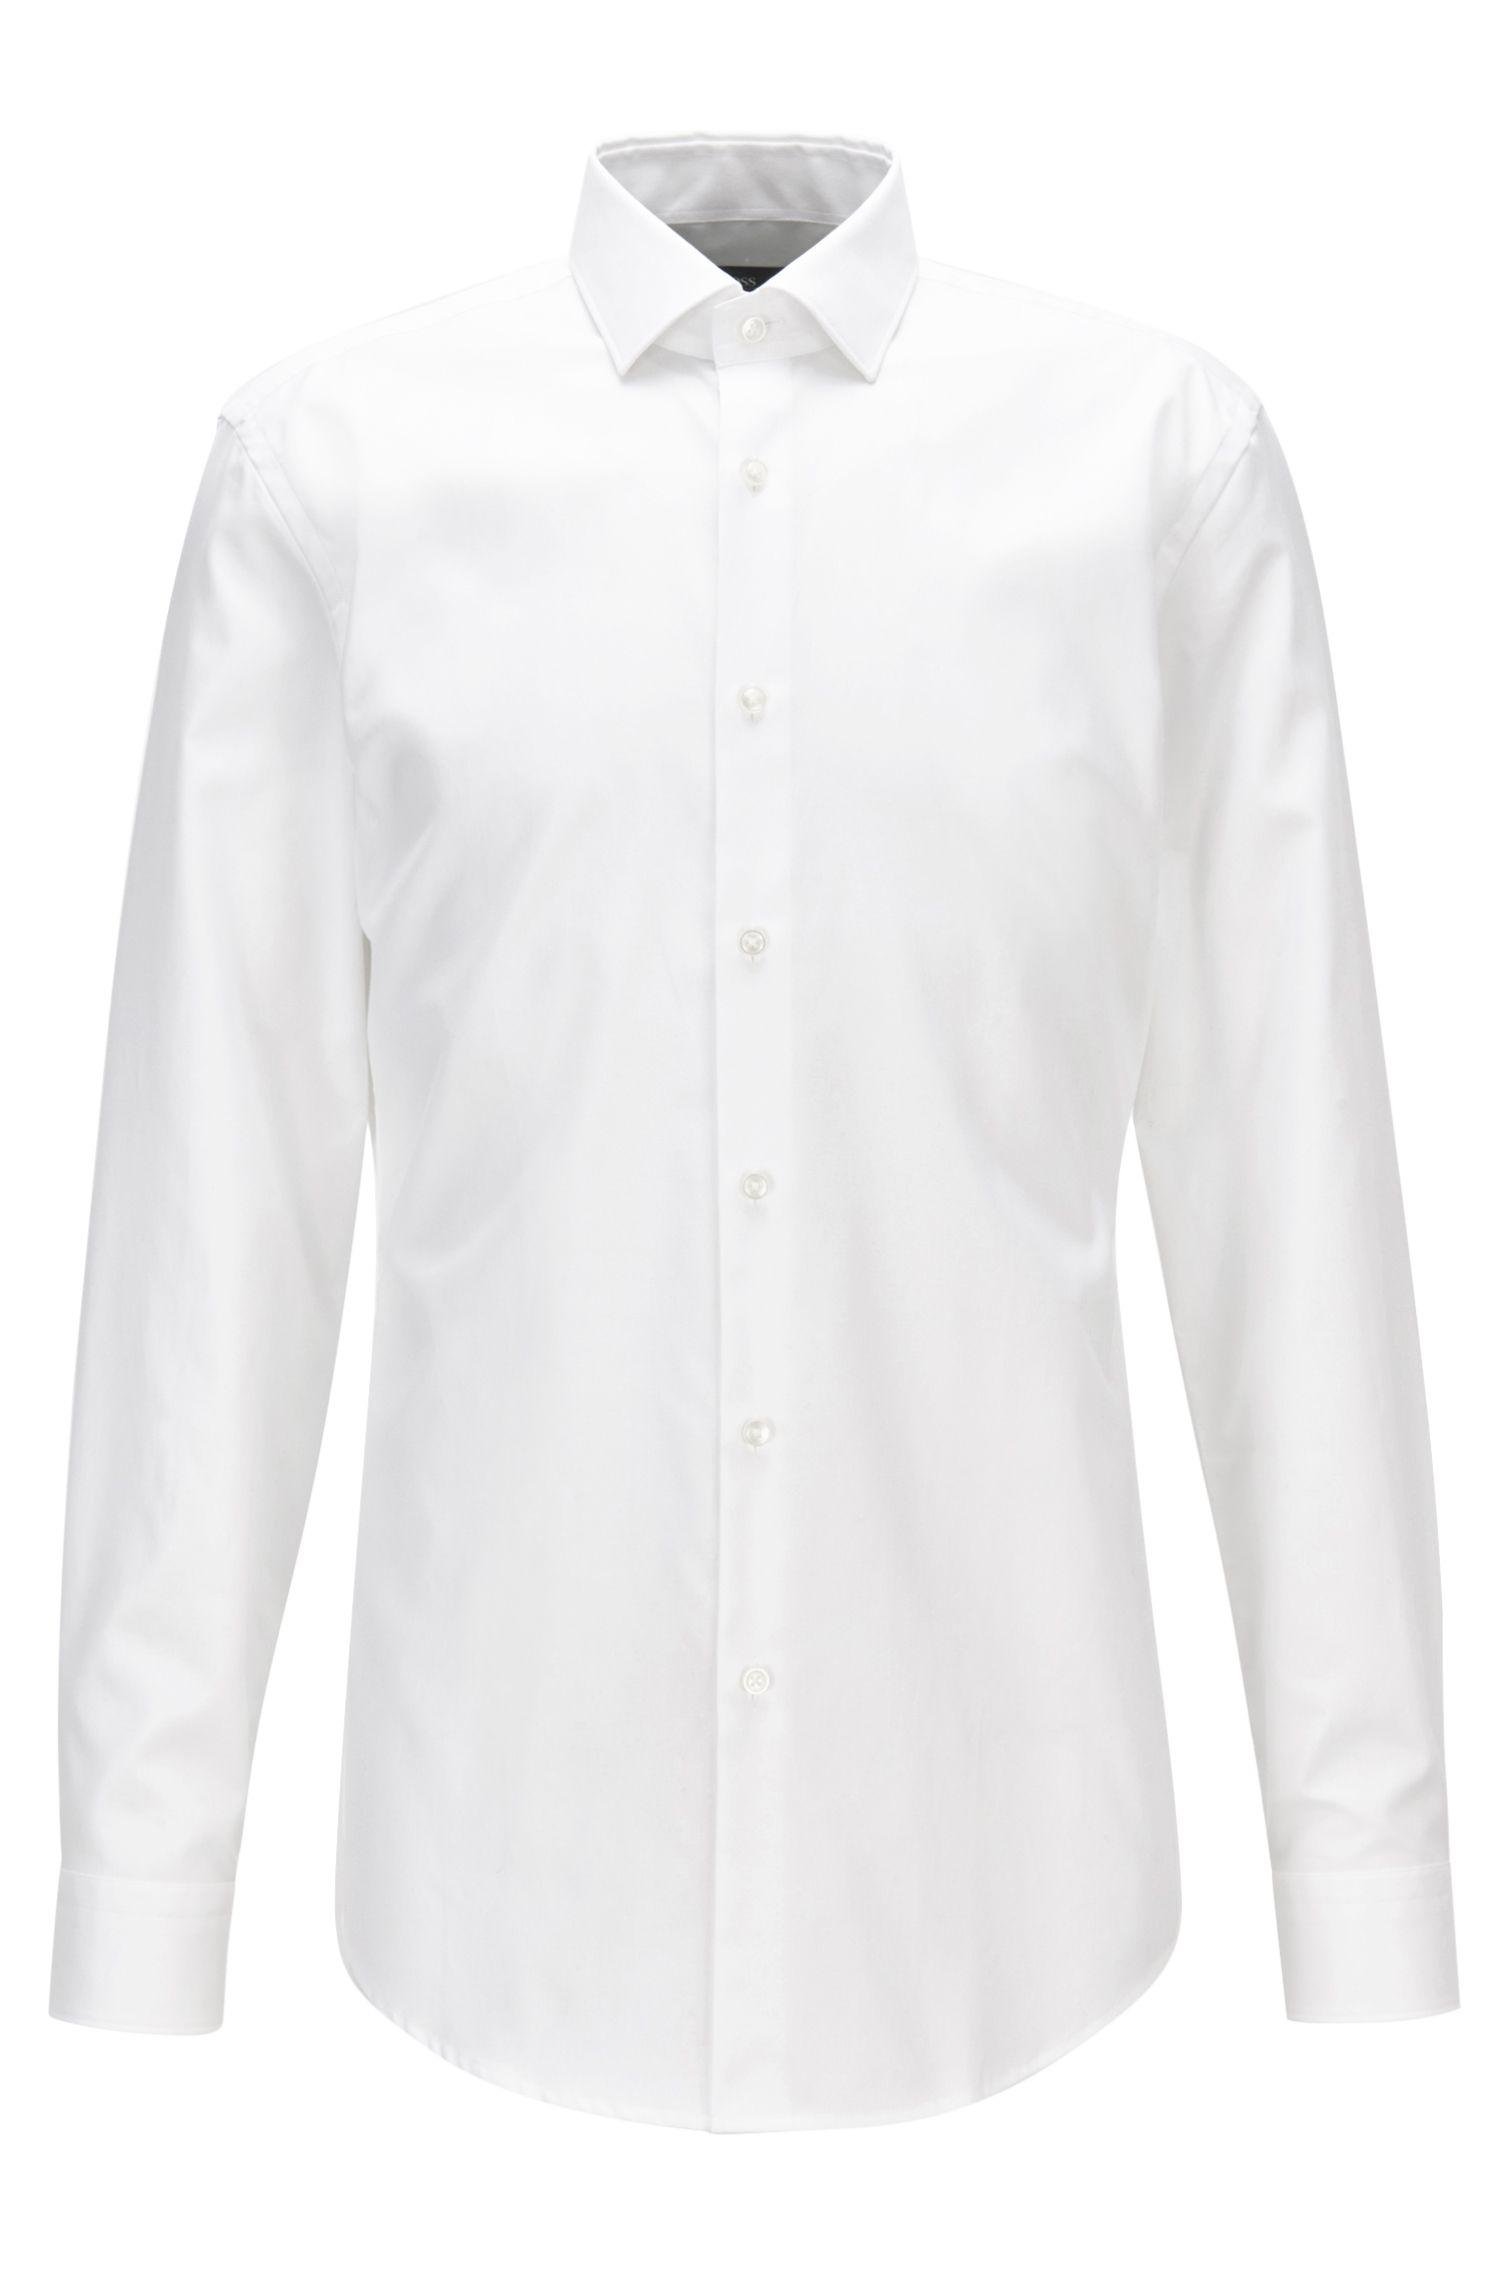 Cotton Dress Shirt, Slim Fit | Ismo, White